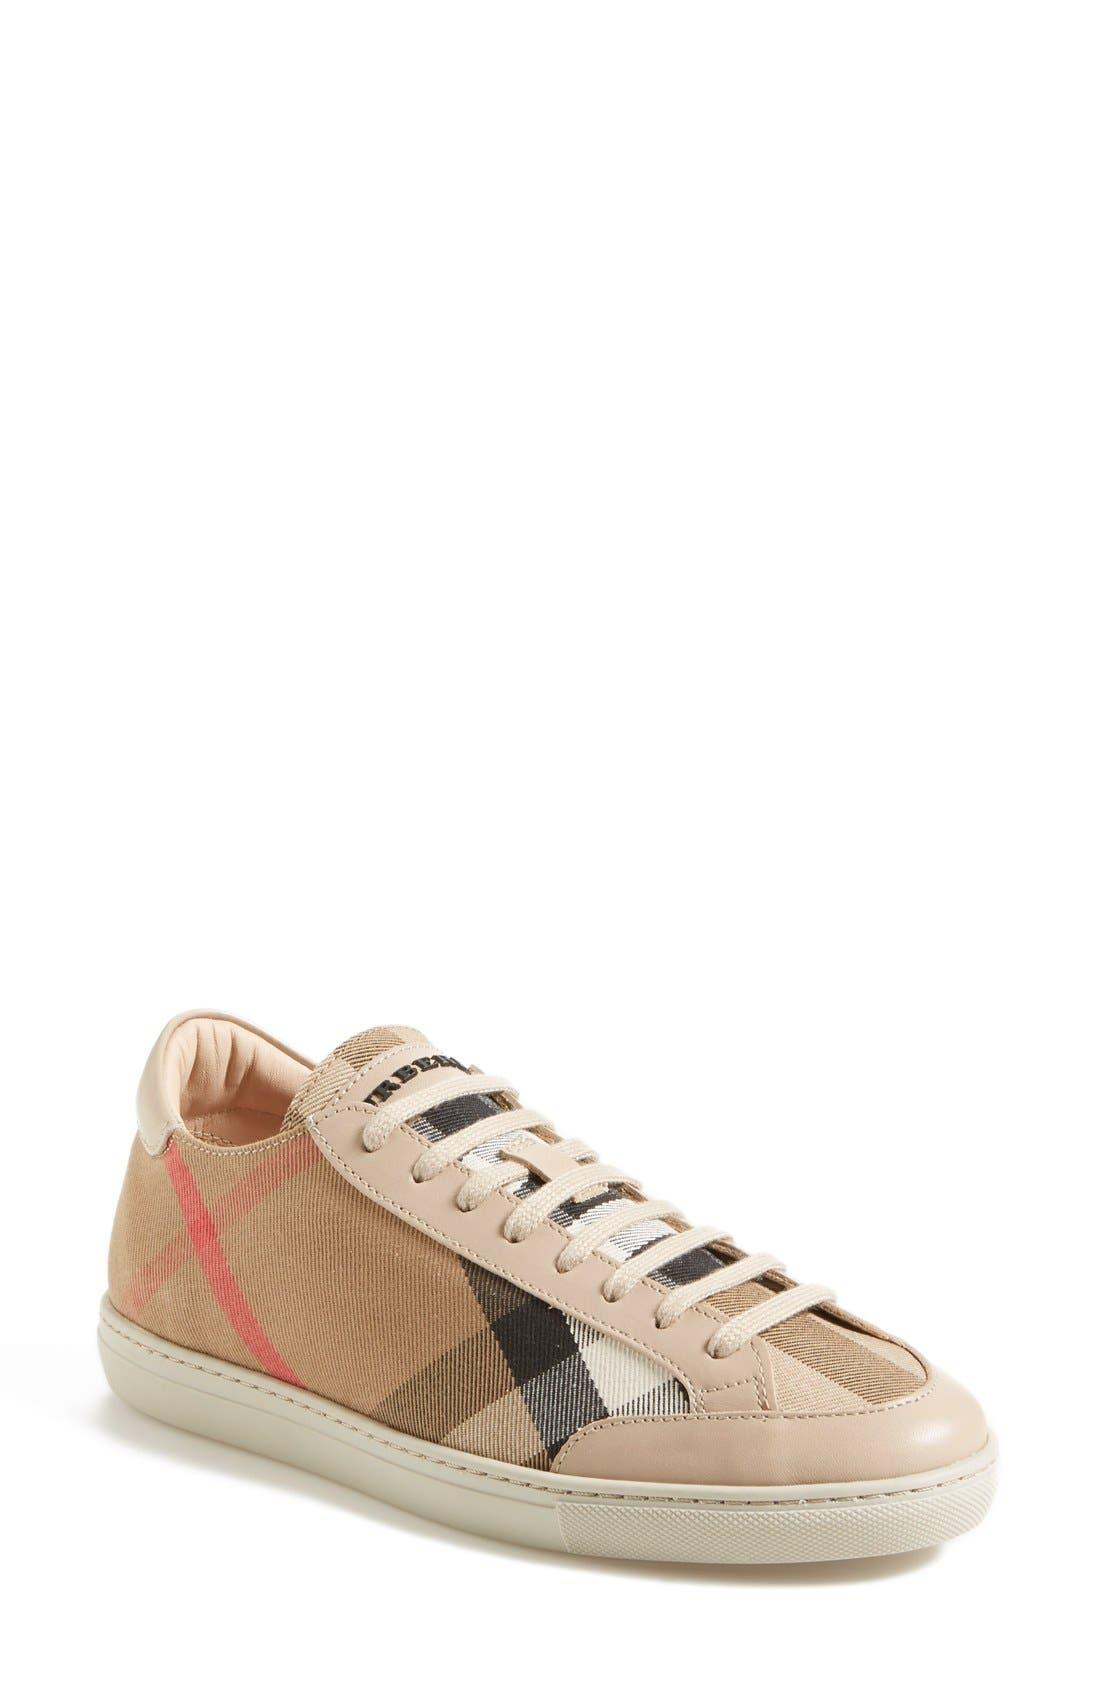 Alternate Image 1 Selected - Burberry 'Hartfields' Sneaker (Women)